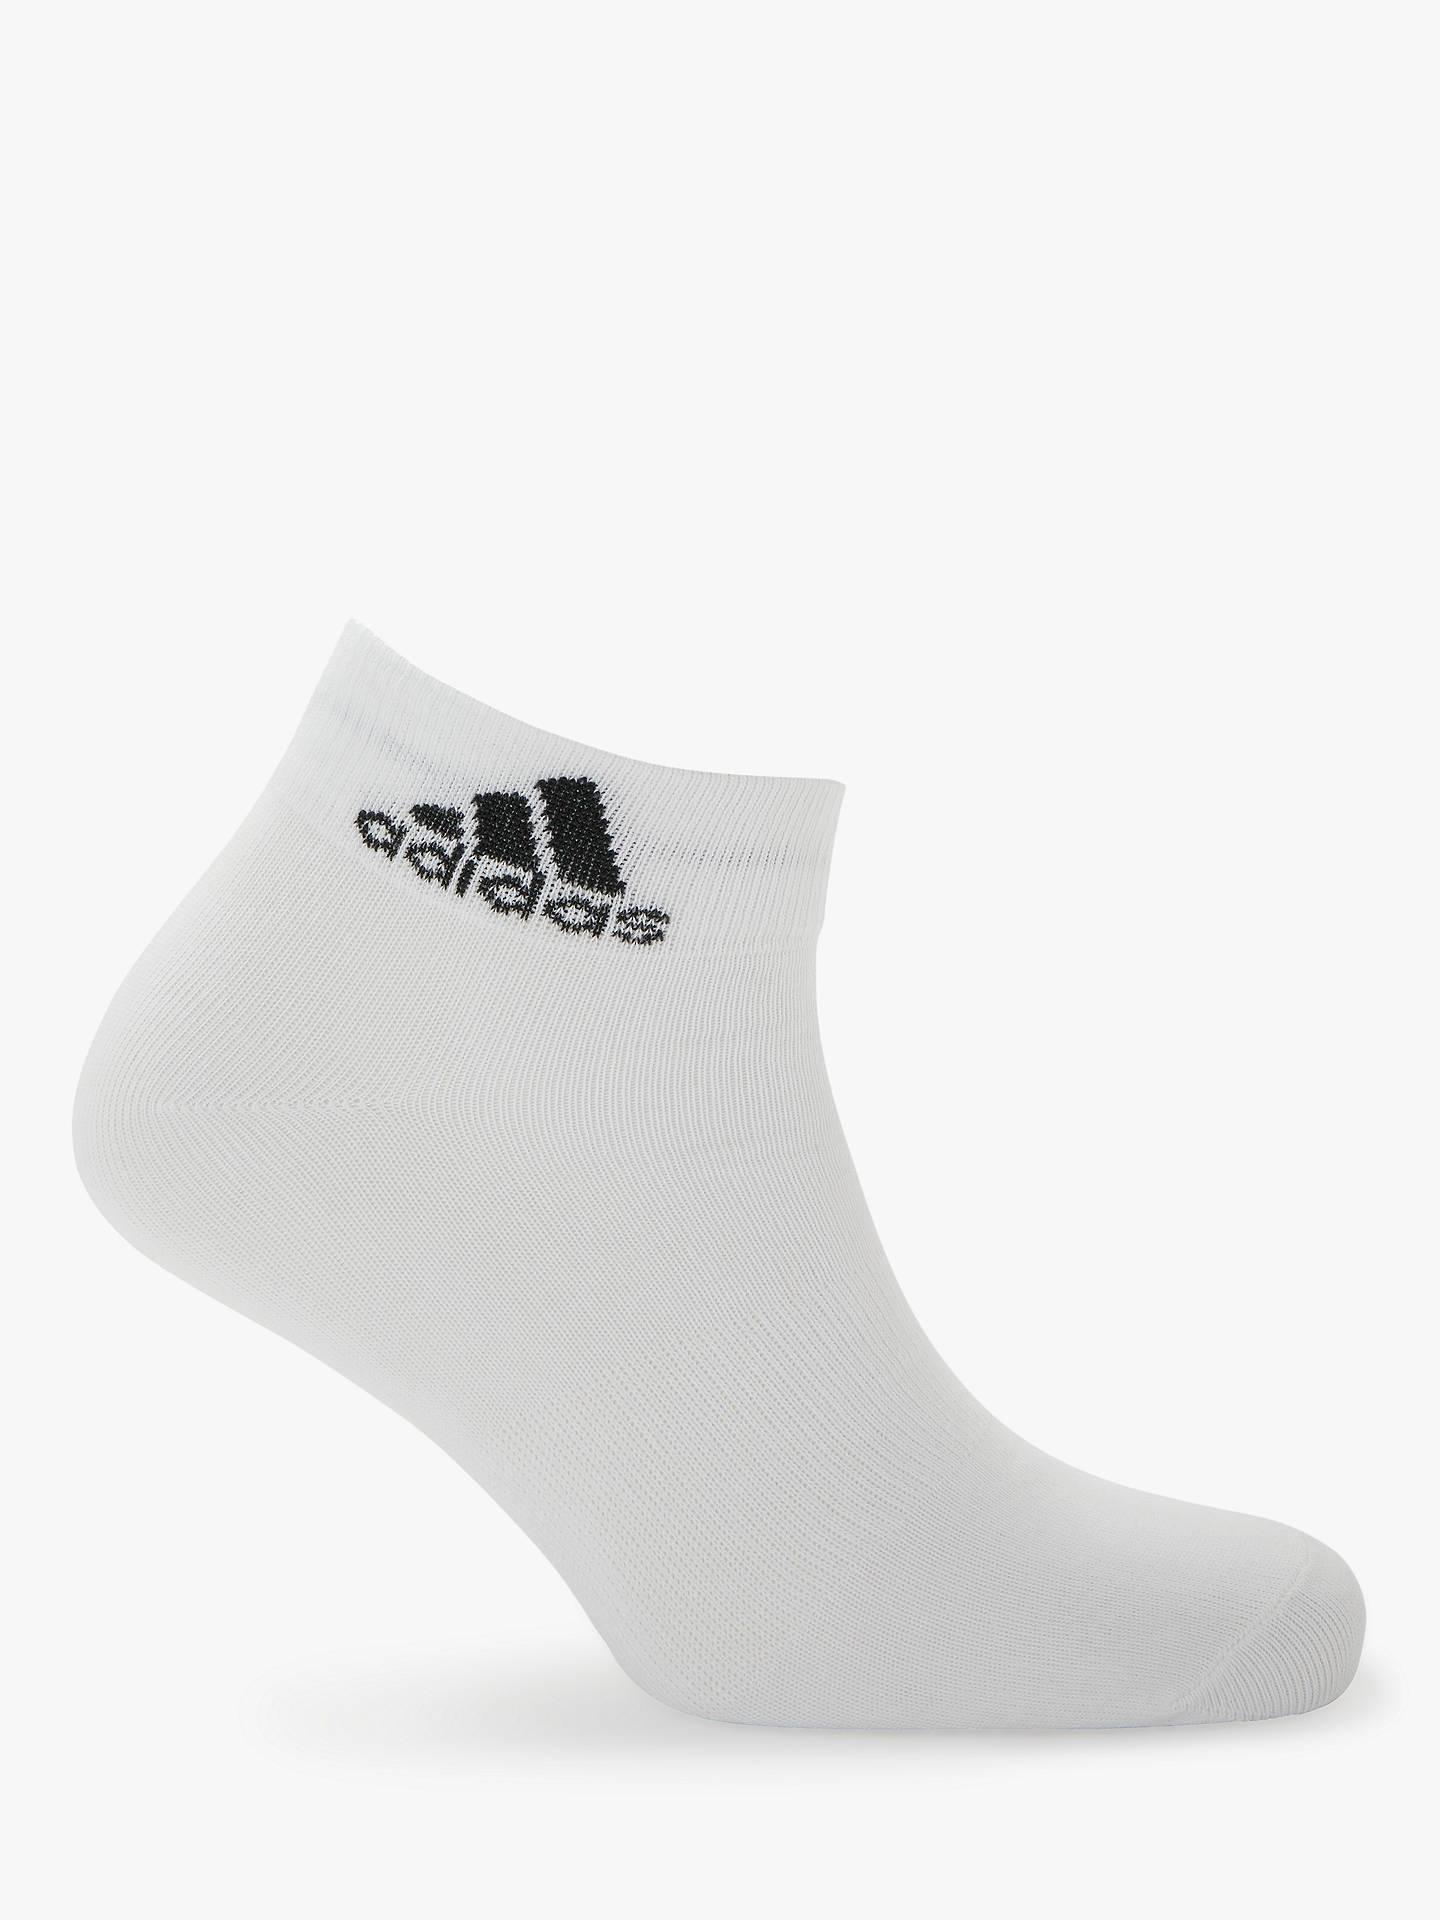 Buyadidas Performance Thin Ankle Socks b2bbde54d811